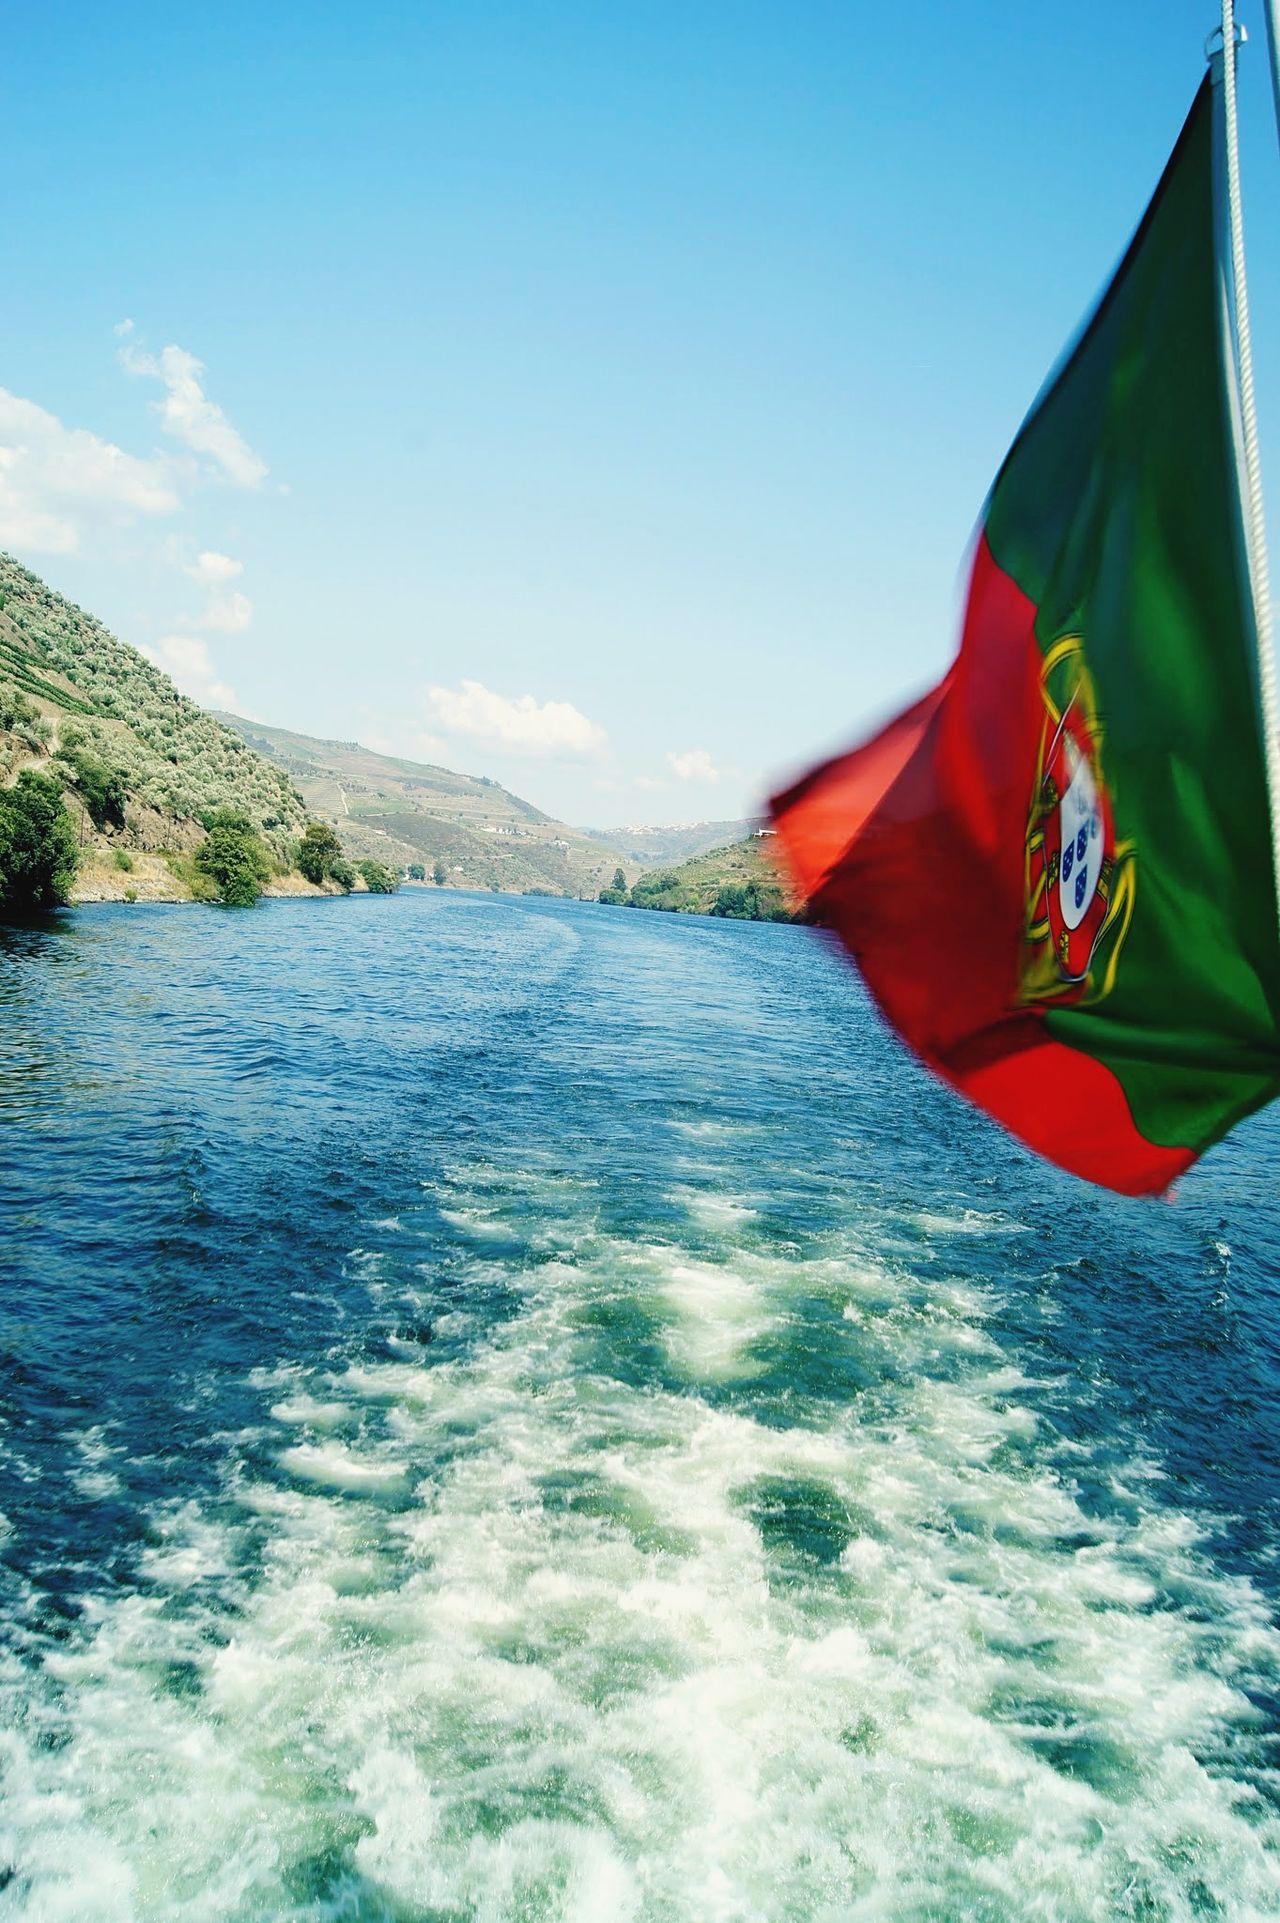 Flag Blue Sky Water No People Mountain Nature Outdoors Day Ships⚓️⛵️🚢 Porto Douro  Oporto Portugal